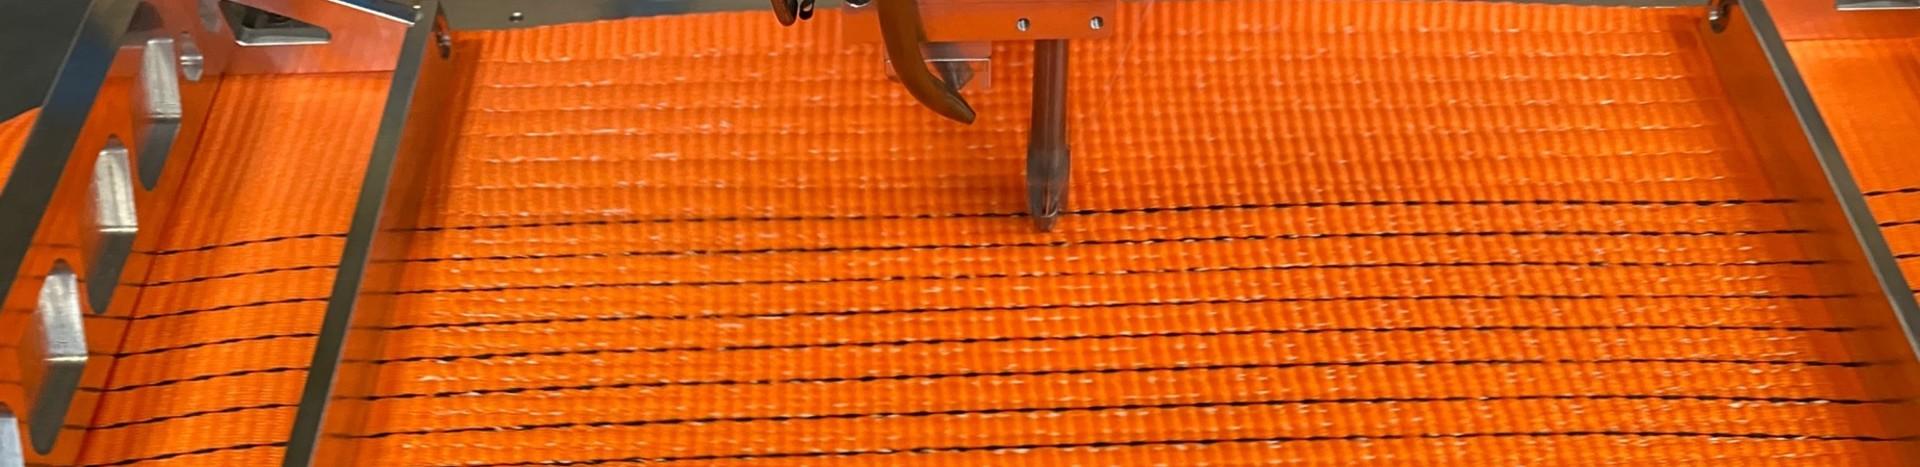 web slings production